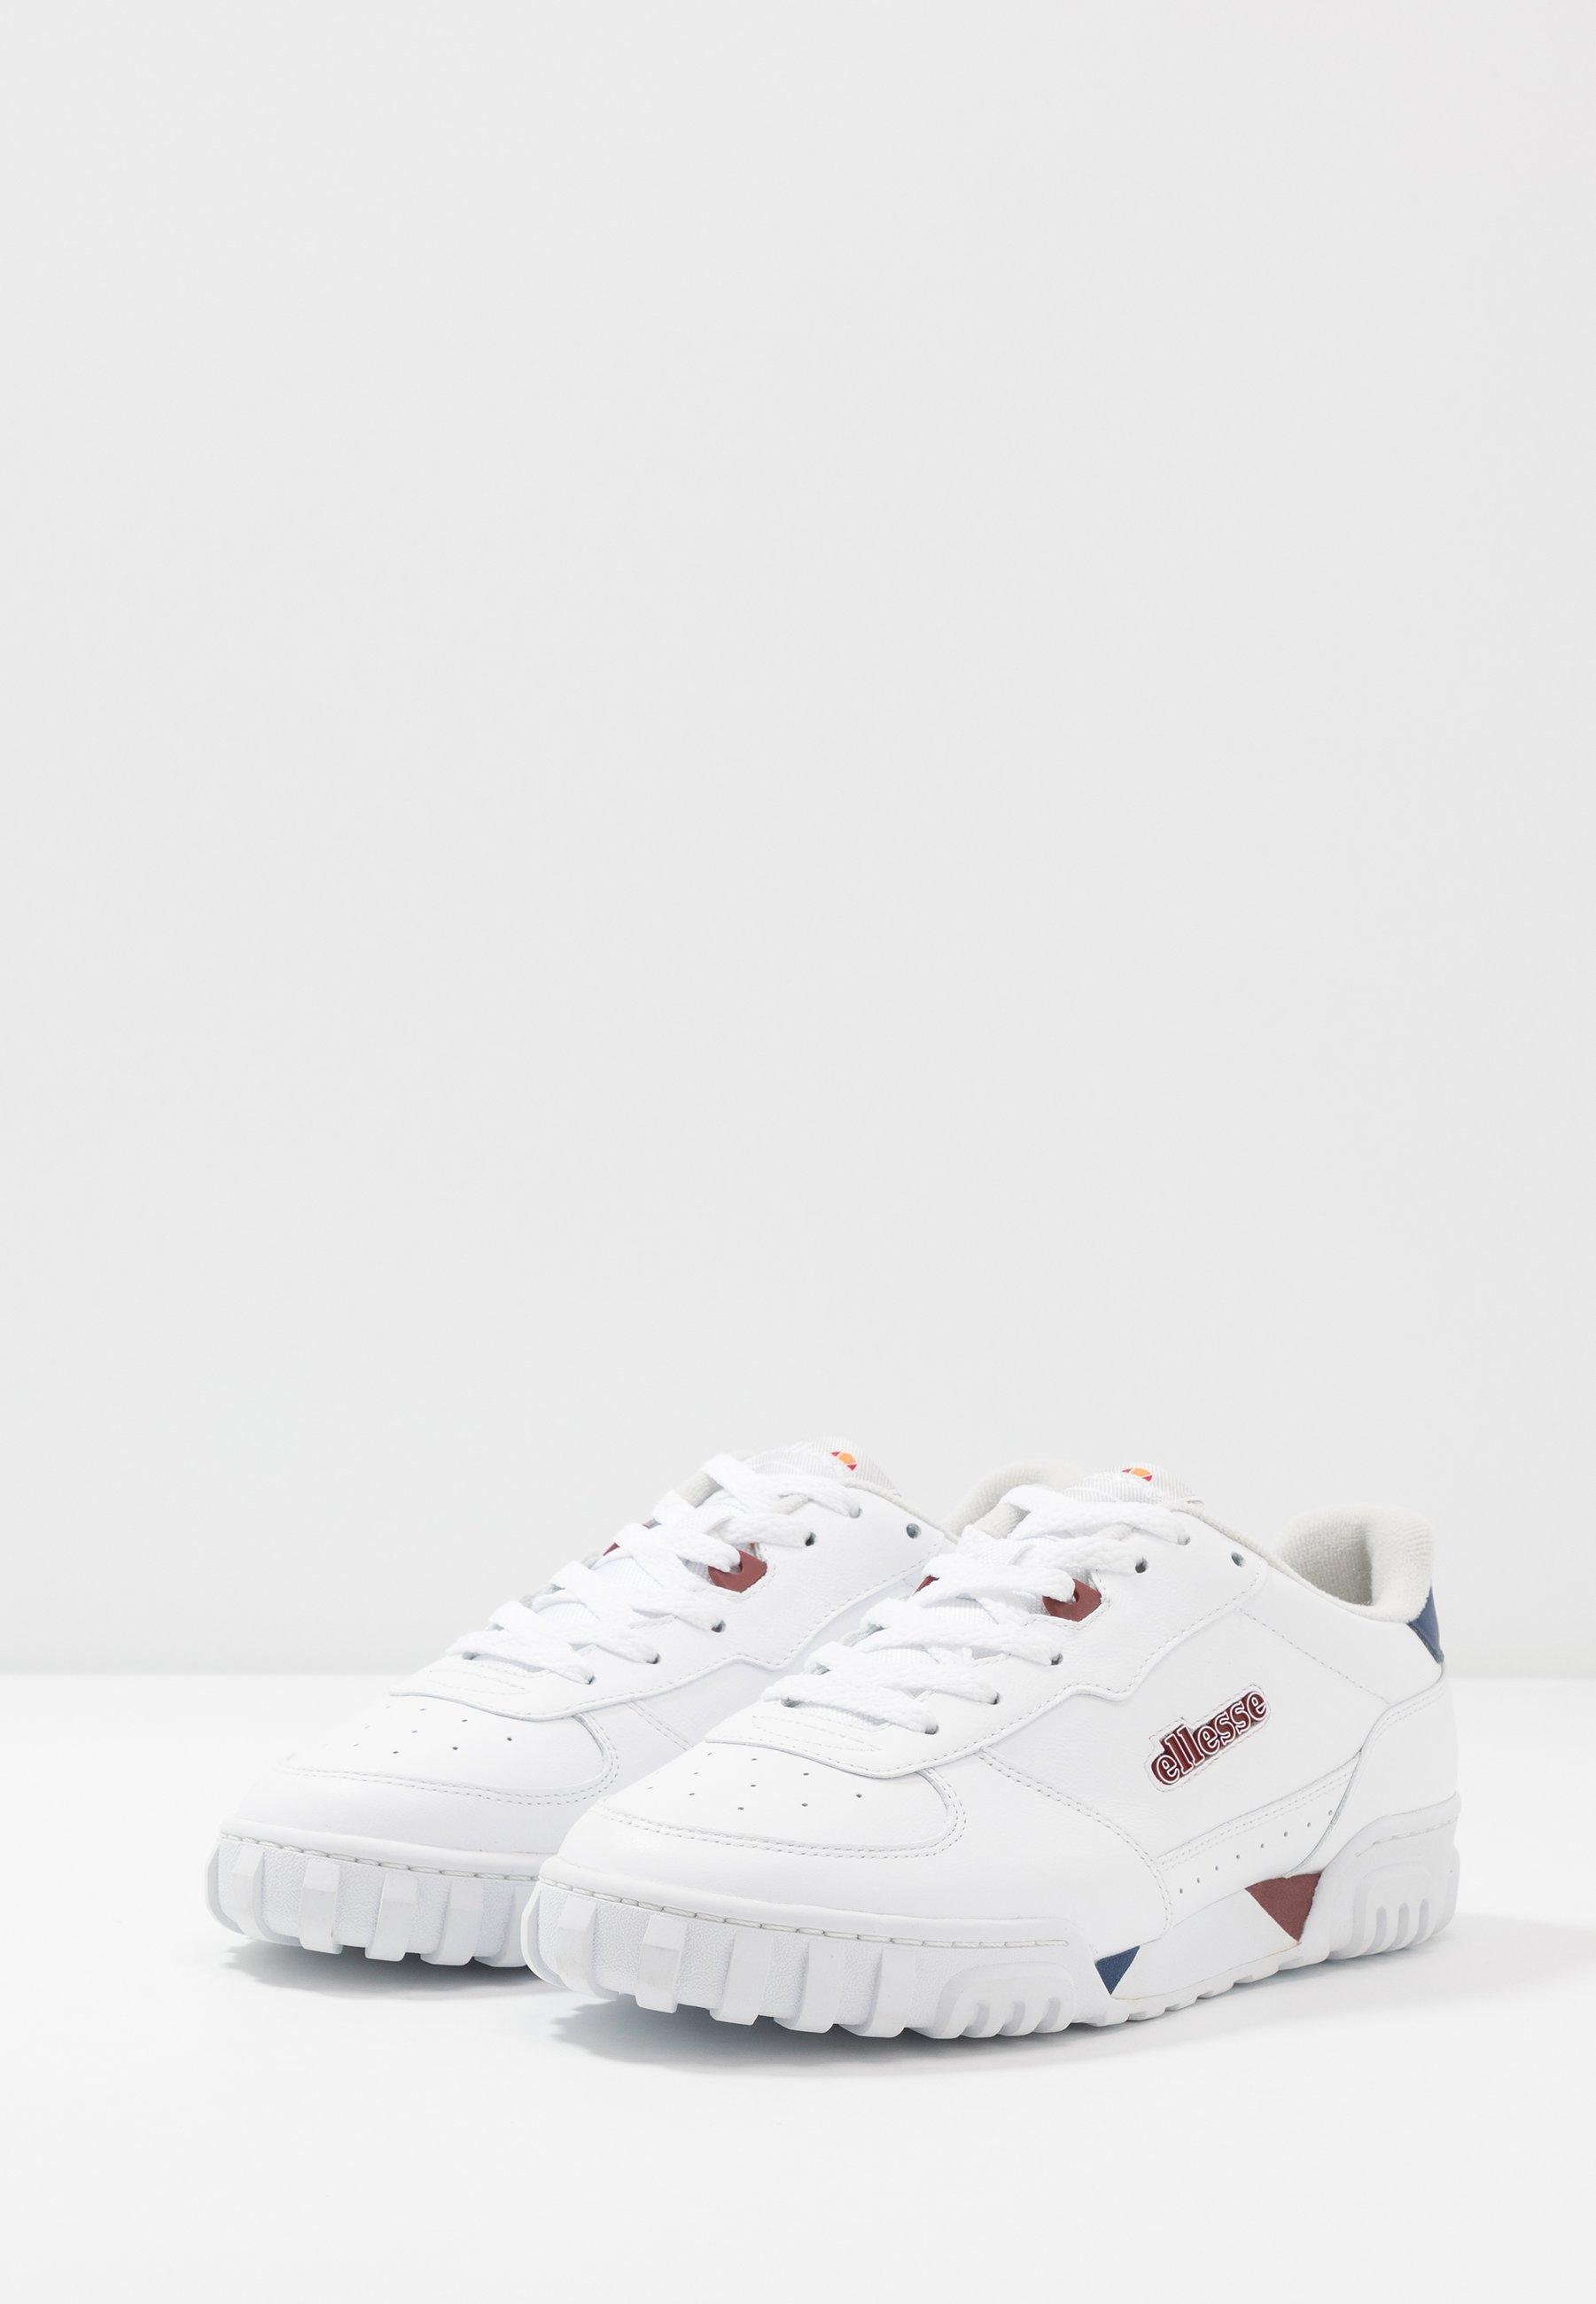 Ellesse TANKER - Sneaker low - white/dark blue/dark red/weiß - Herrenschuhe vPUpy